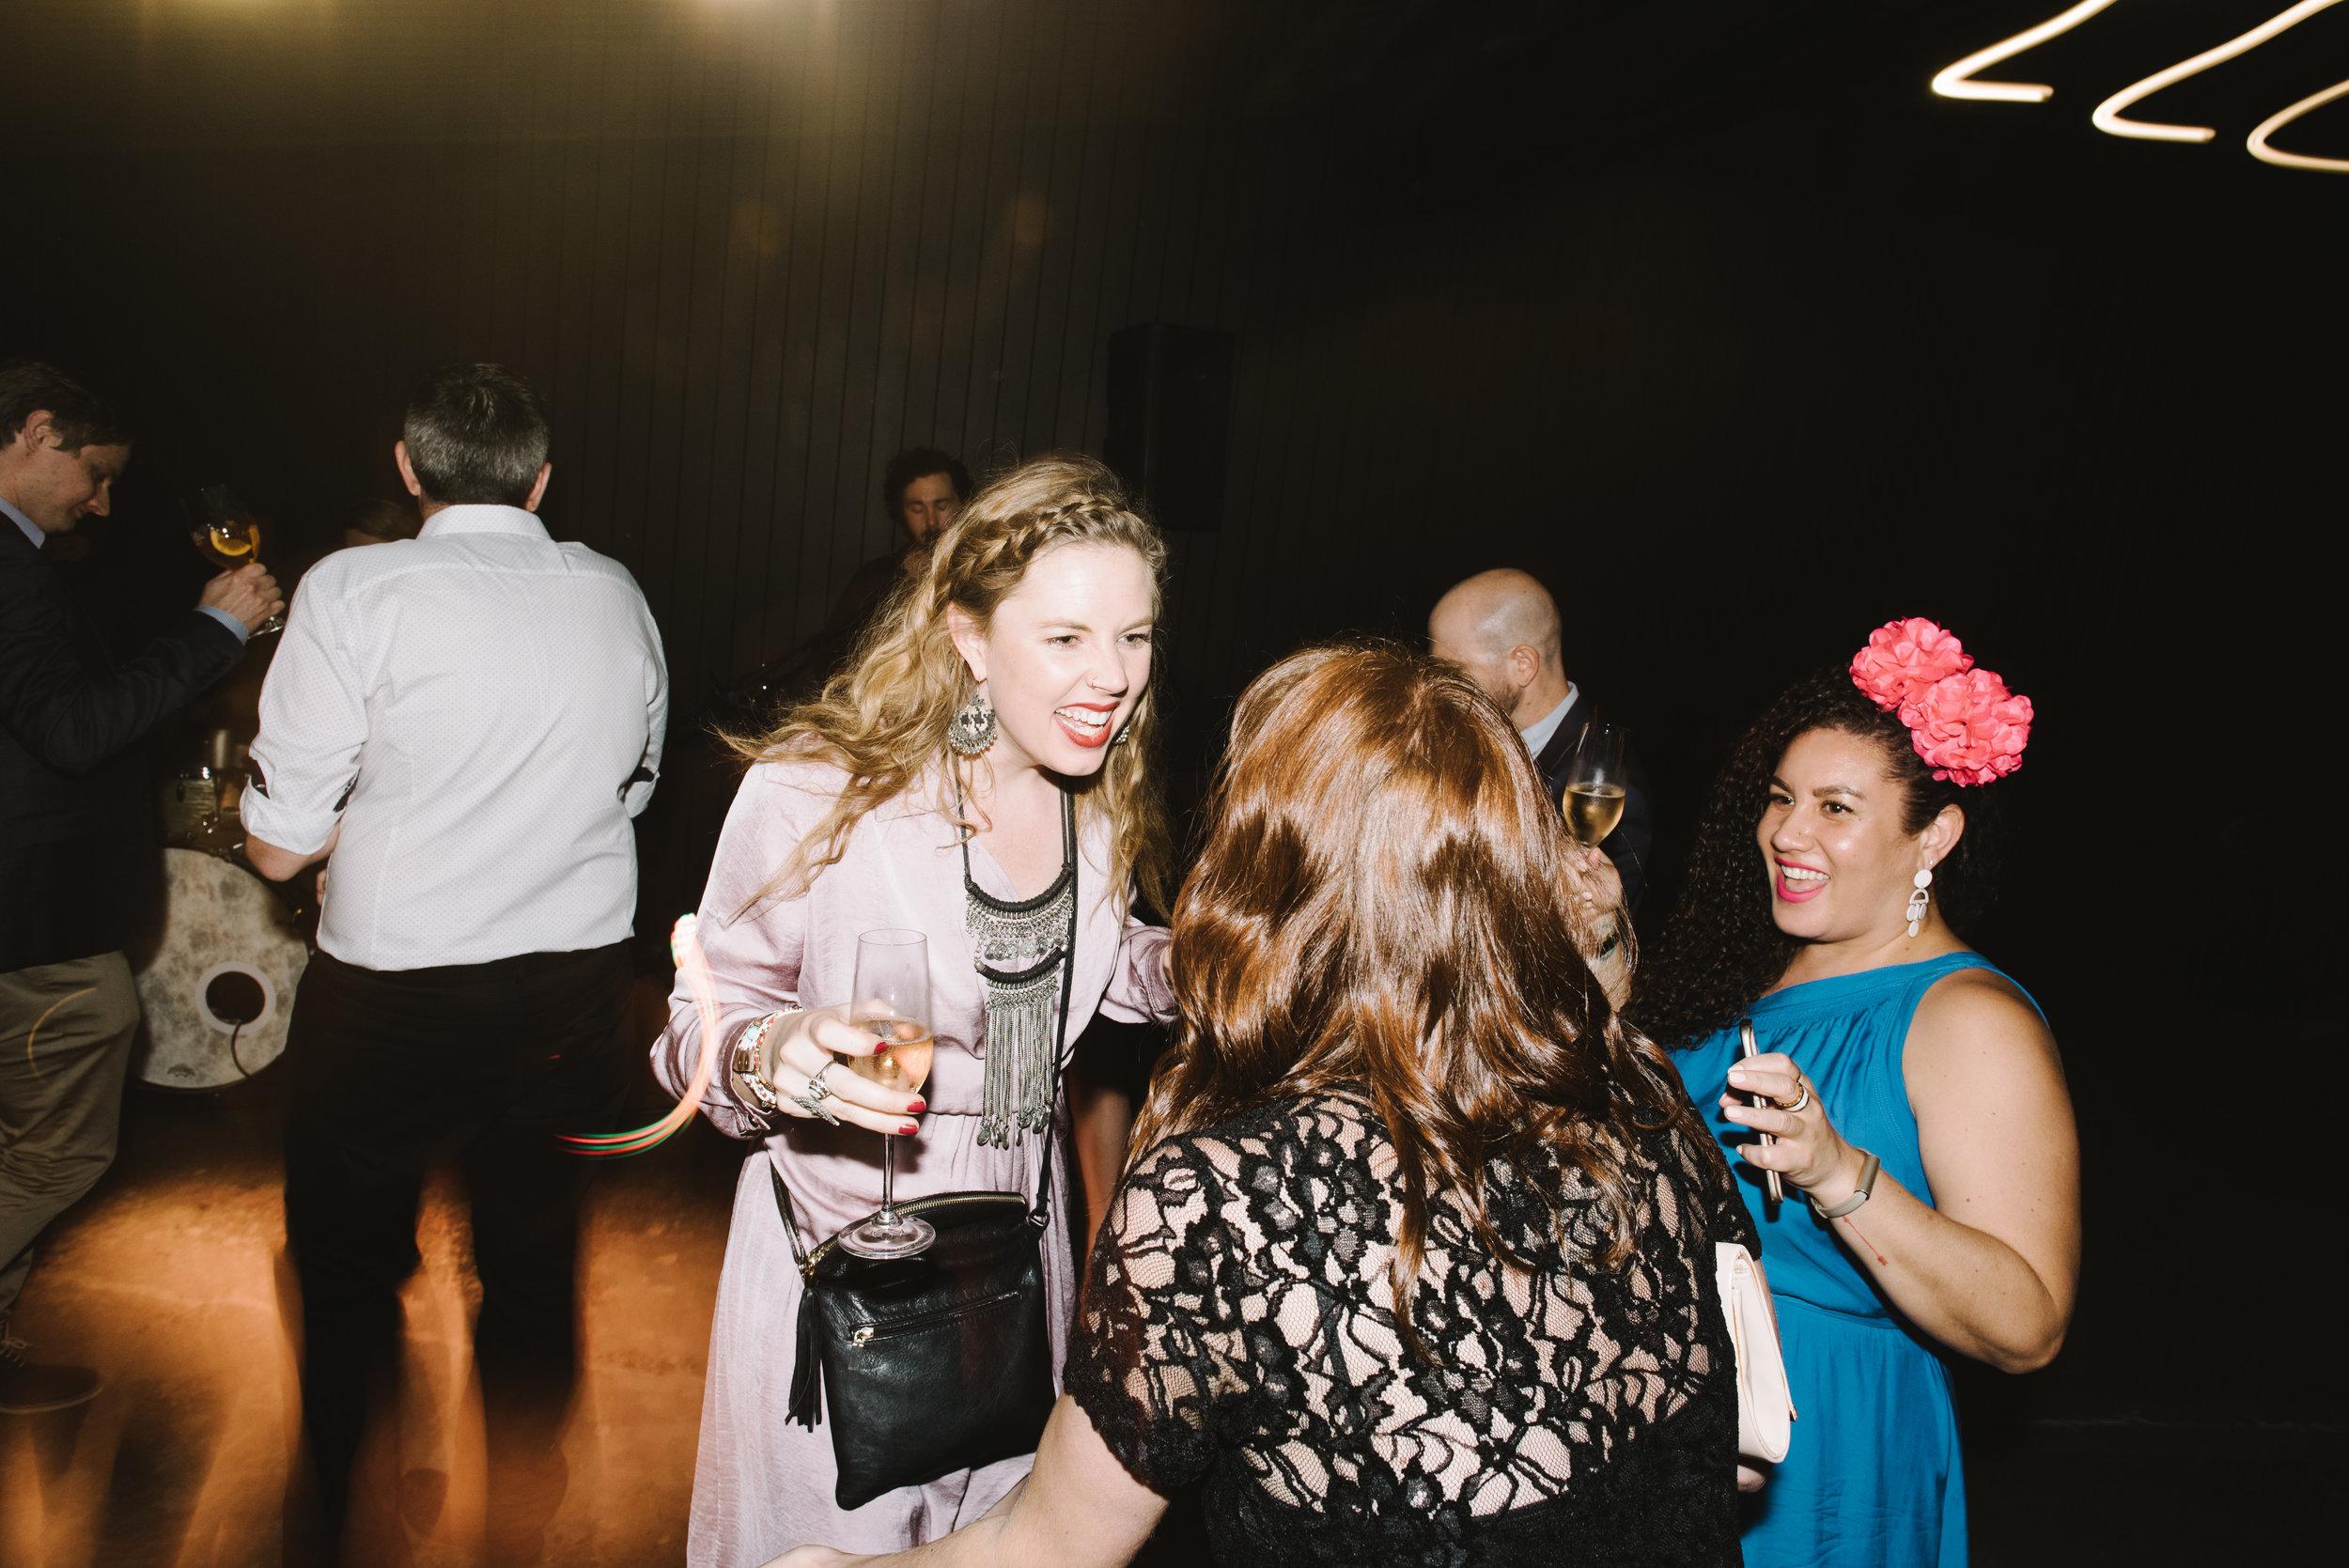 refinery-brisbane-wedding-reception-17.jpg